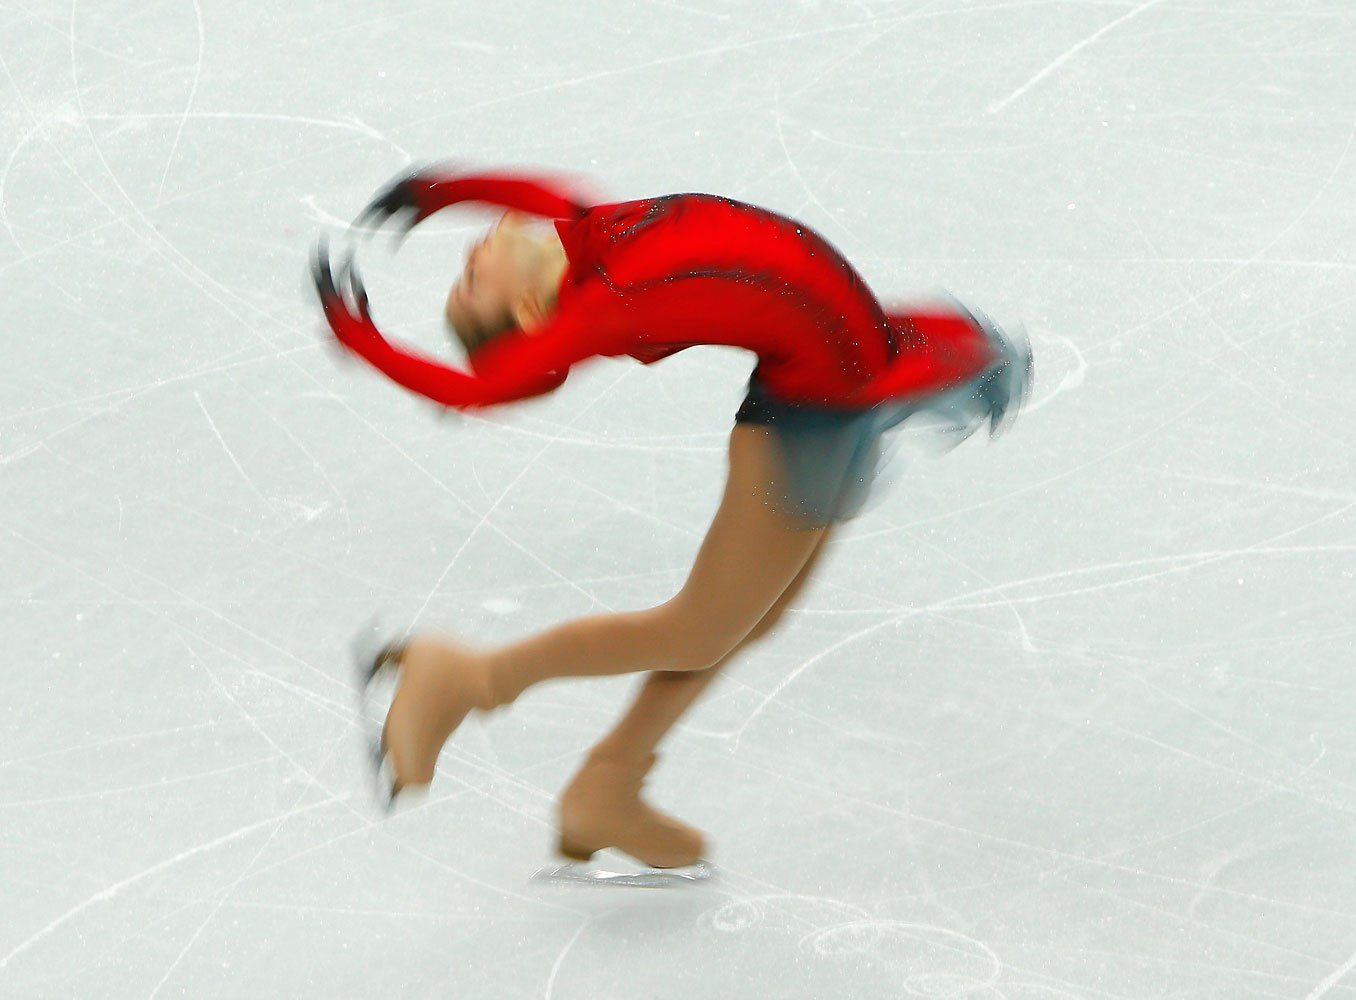 Yulia Lipnitskaya of Russia competes during the figure skating team ladies' free skating, Feb. 9 2014.